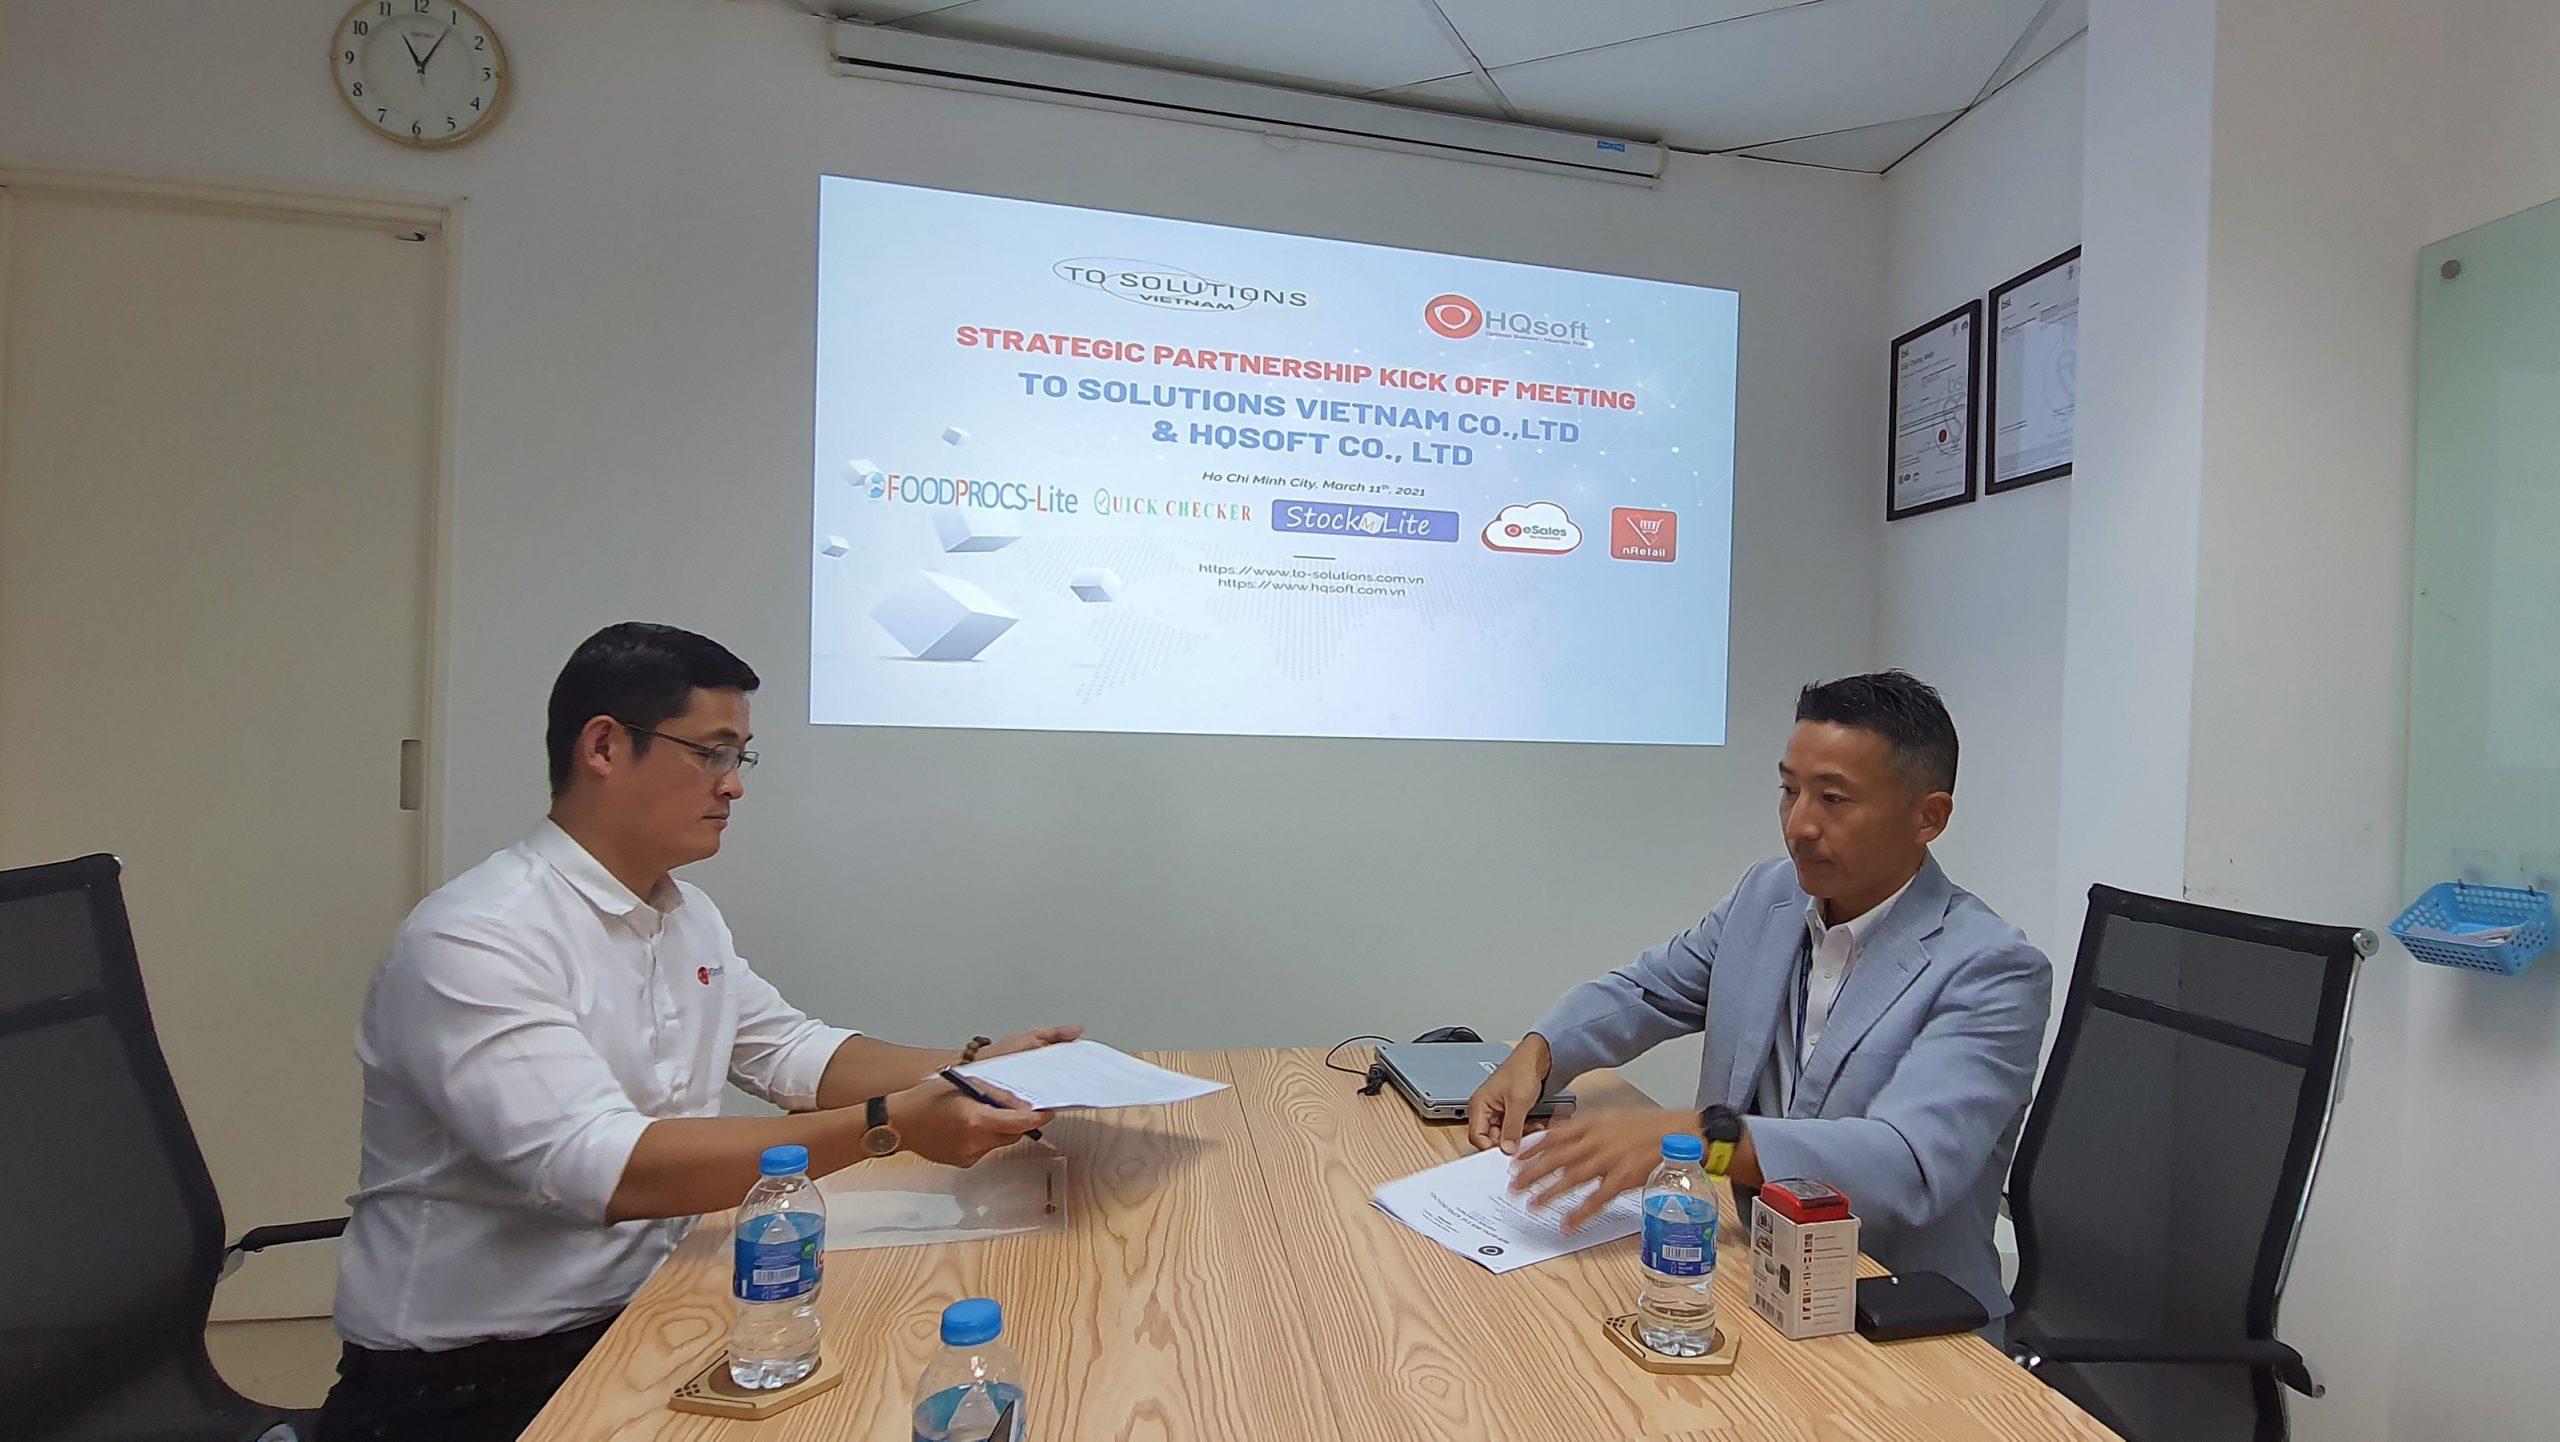 Strategic Partnership kickoff